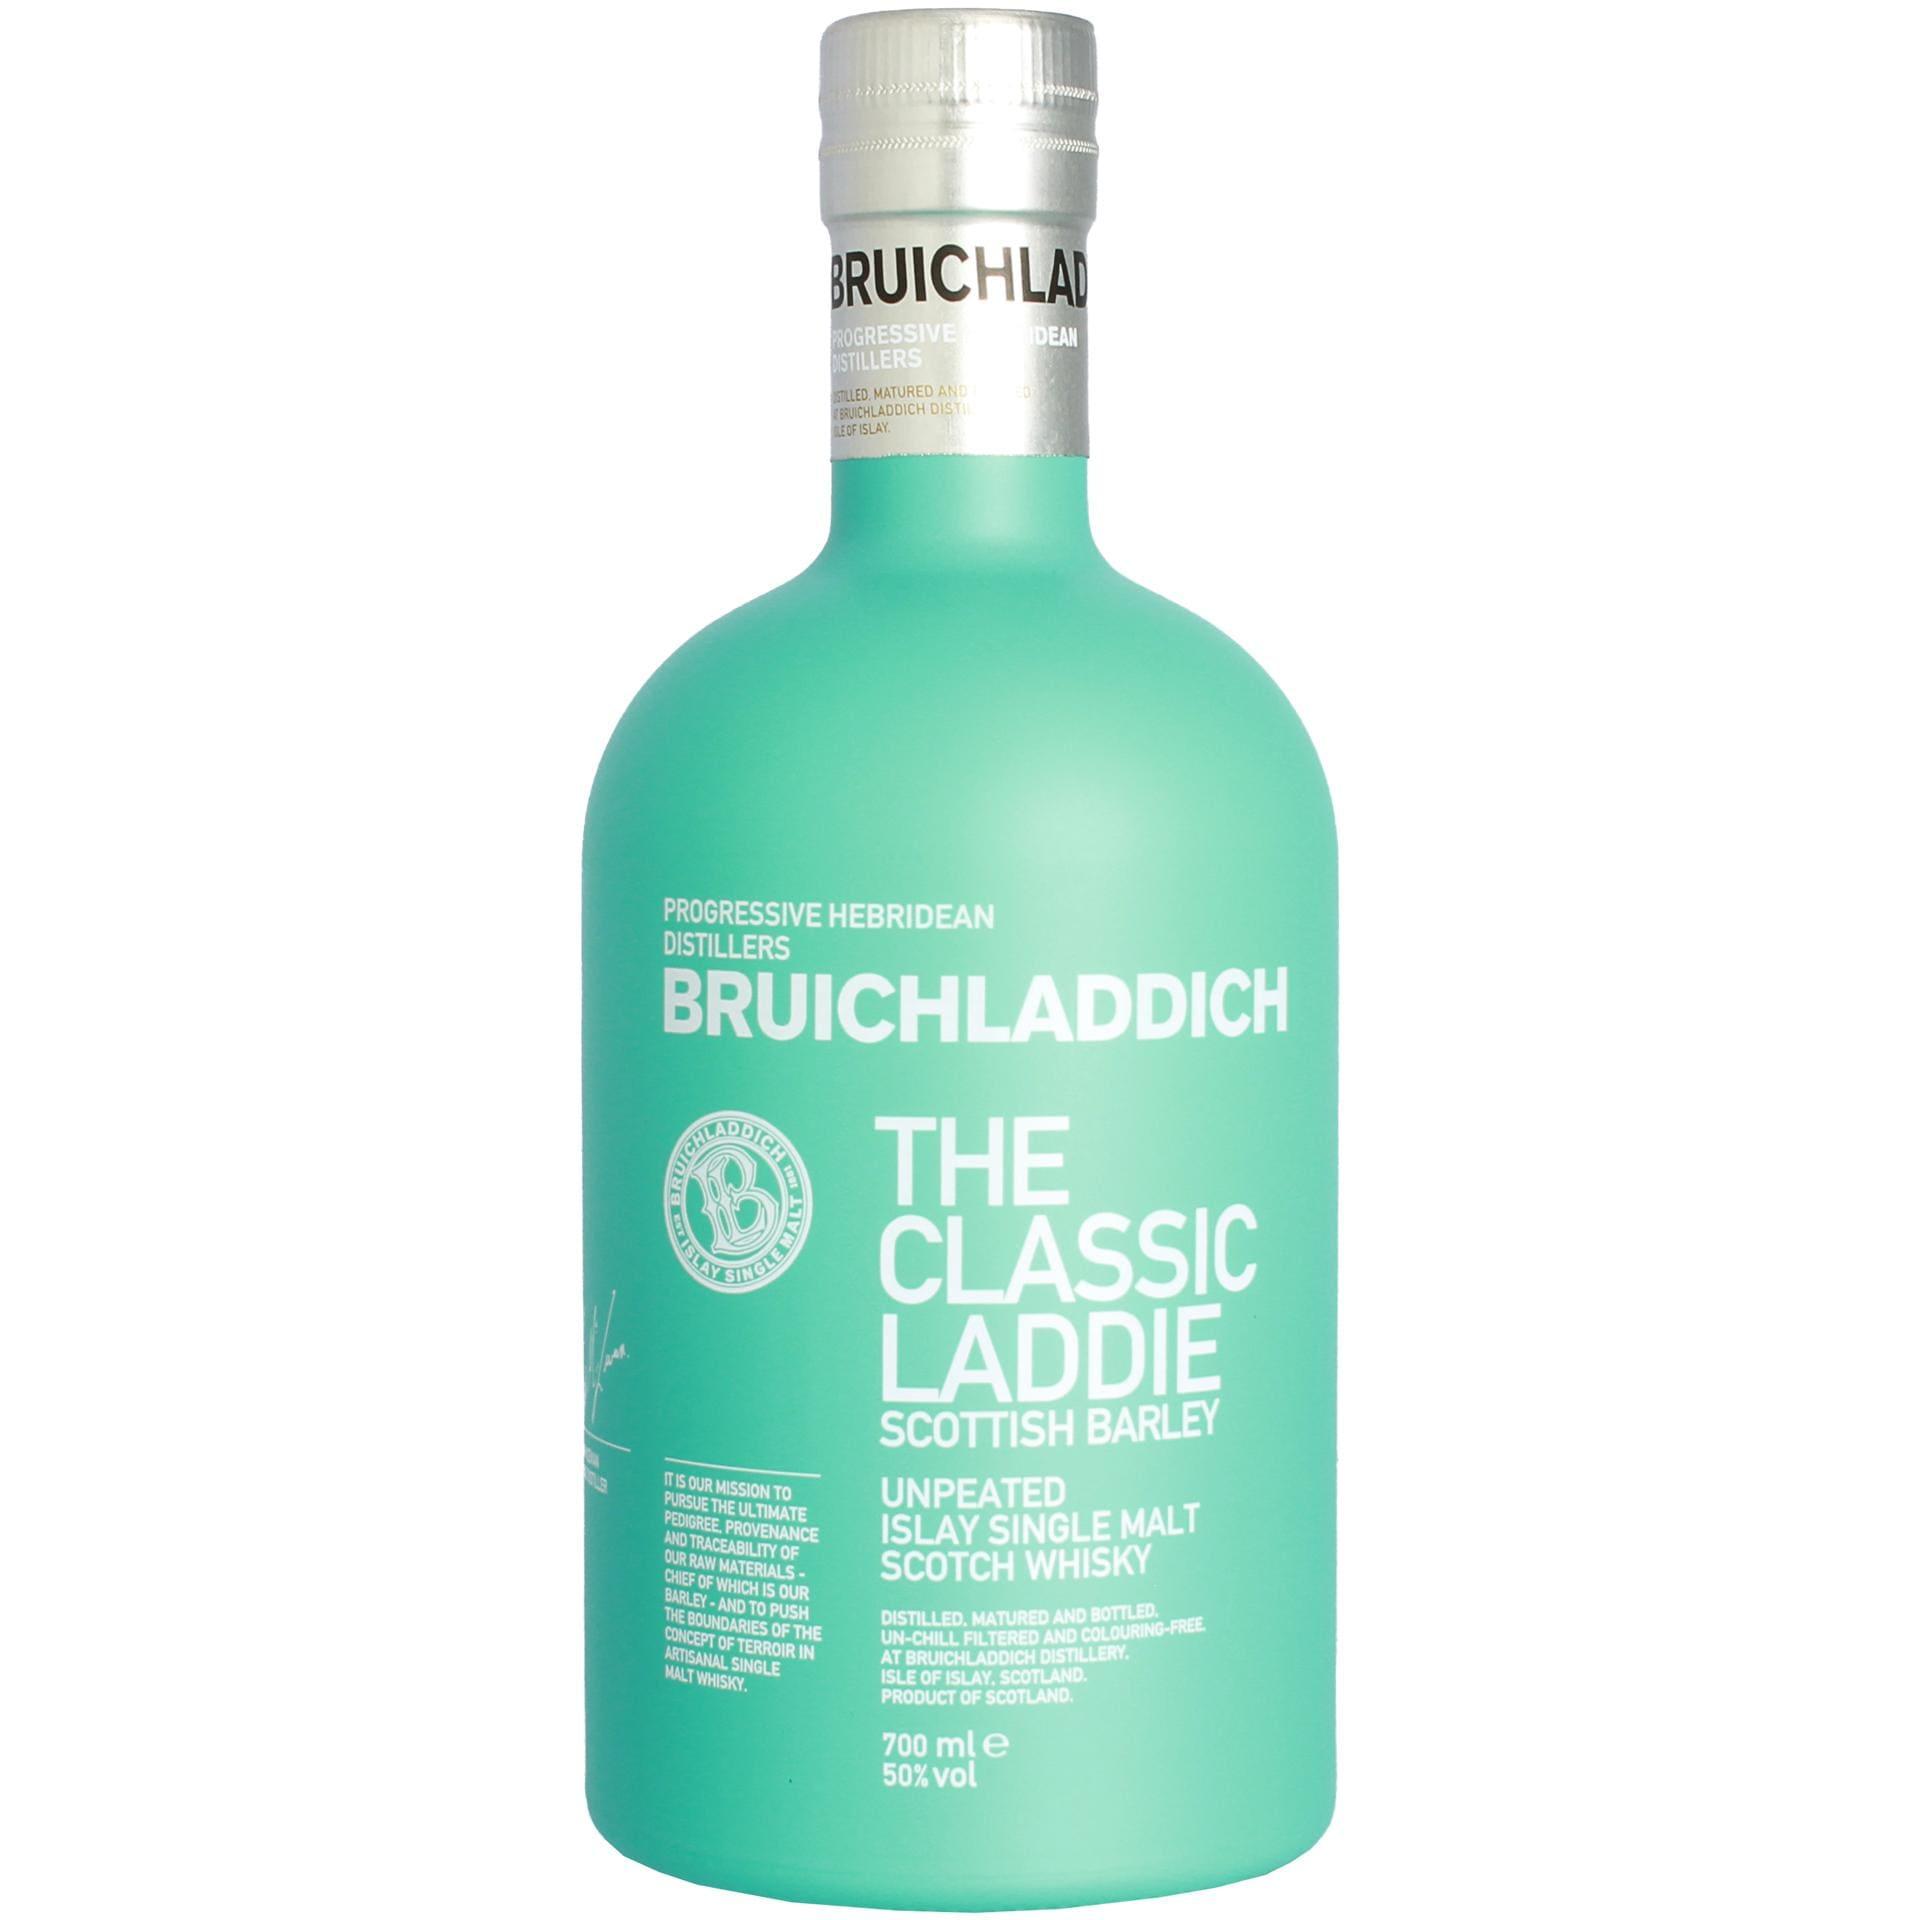 Bruichladdich The Classic Laddie Single Malt Scotch Whisky 0,7l